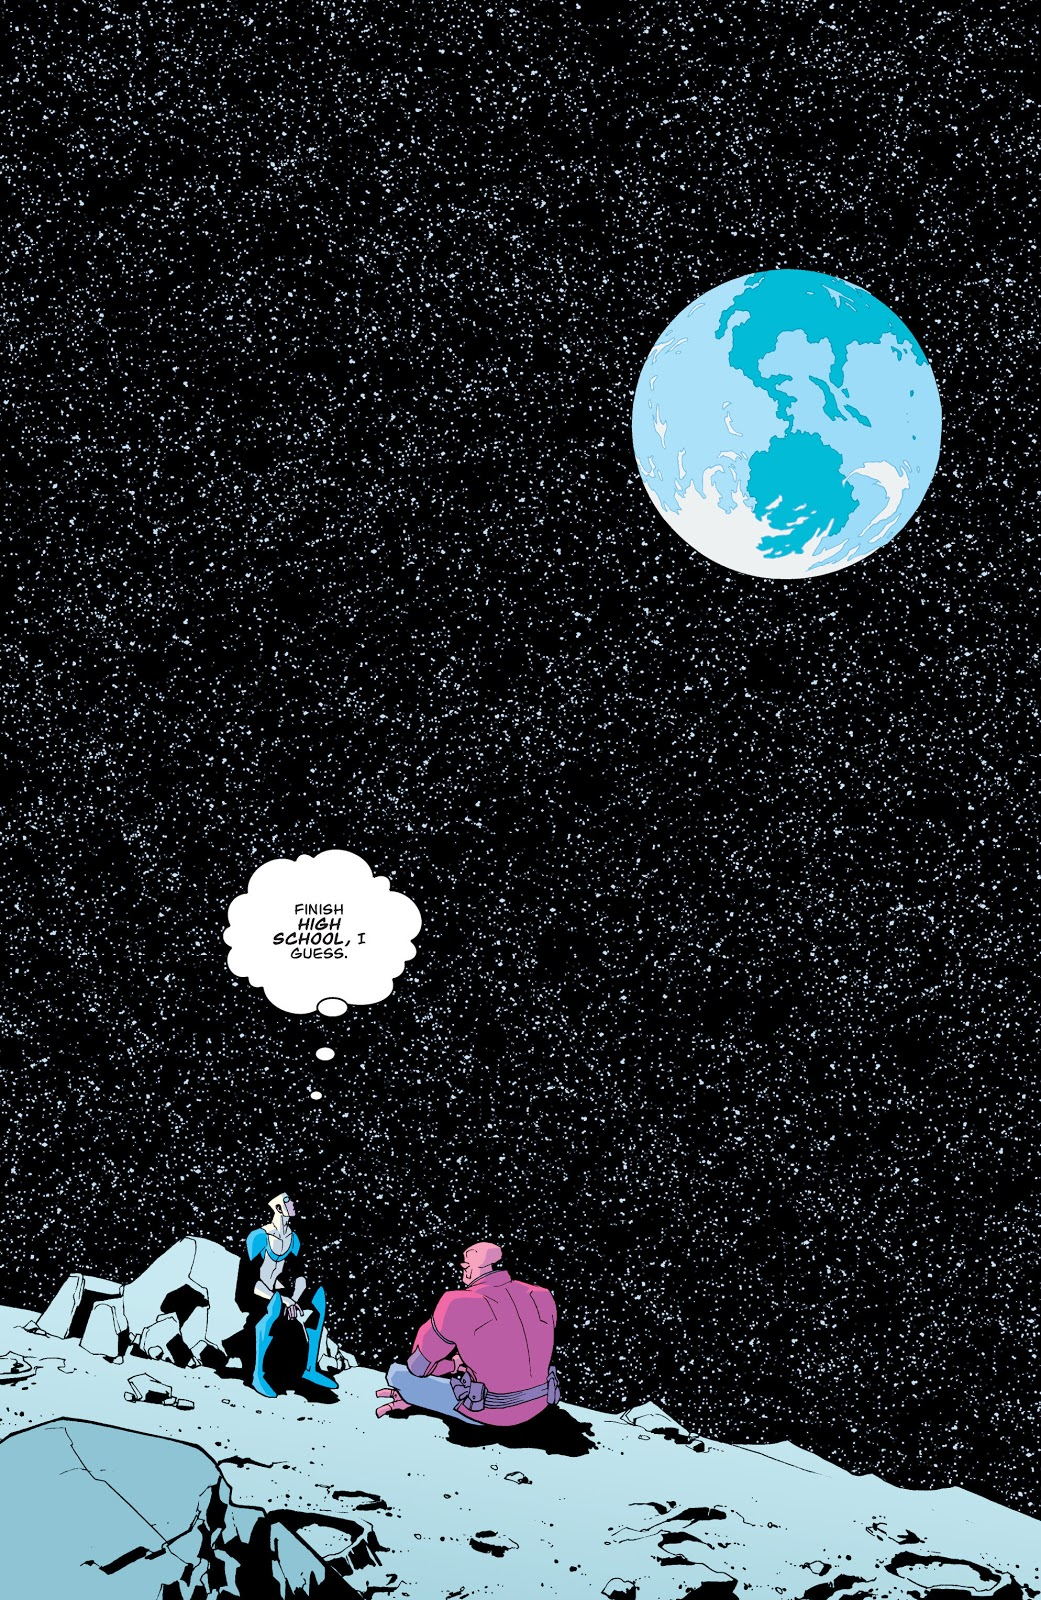 Invincible And Allen The Alien (Invincible #13)